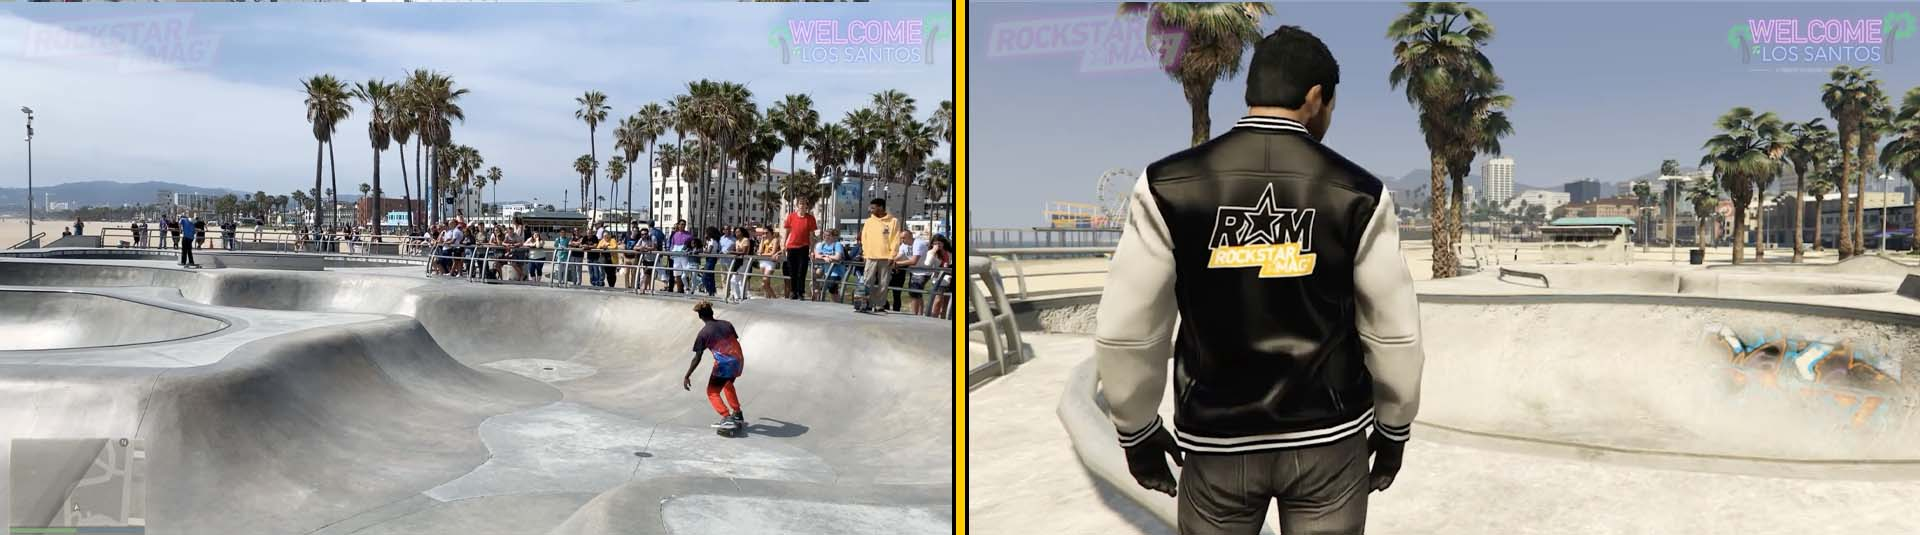 Vespucci 02 : Skate Park